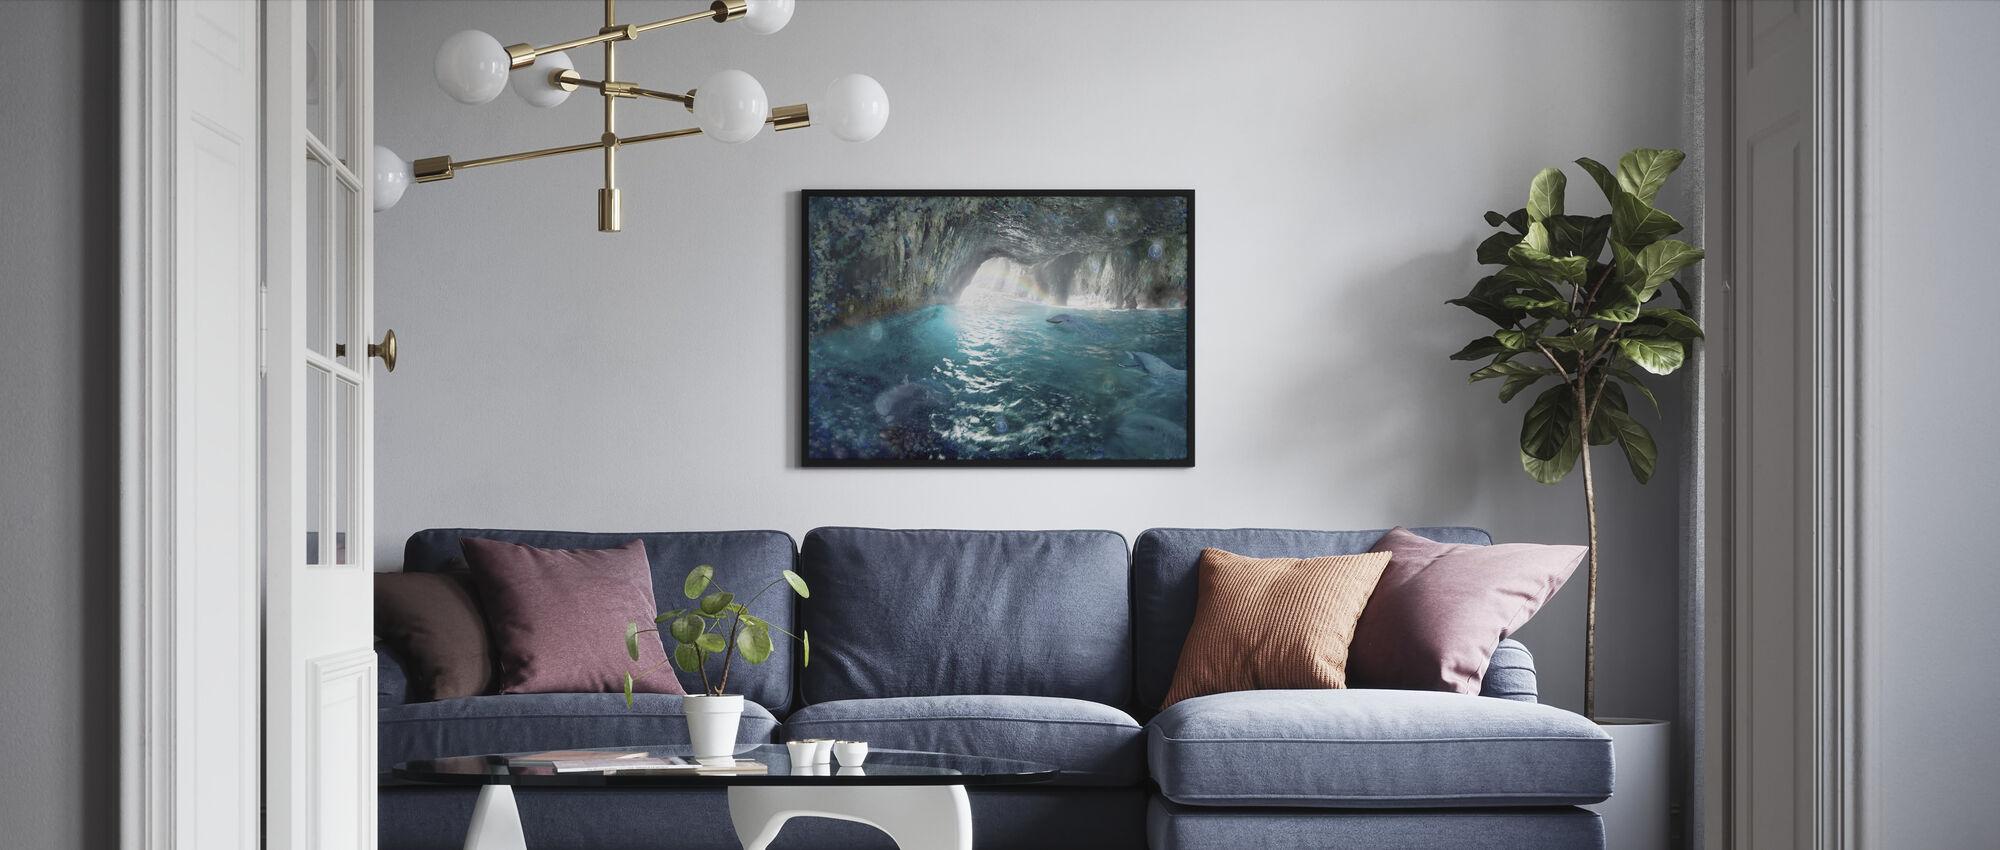 Delfin Seacave - Inramad tavla - Vardagsrum